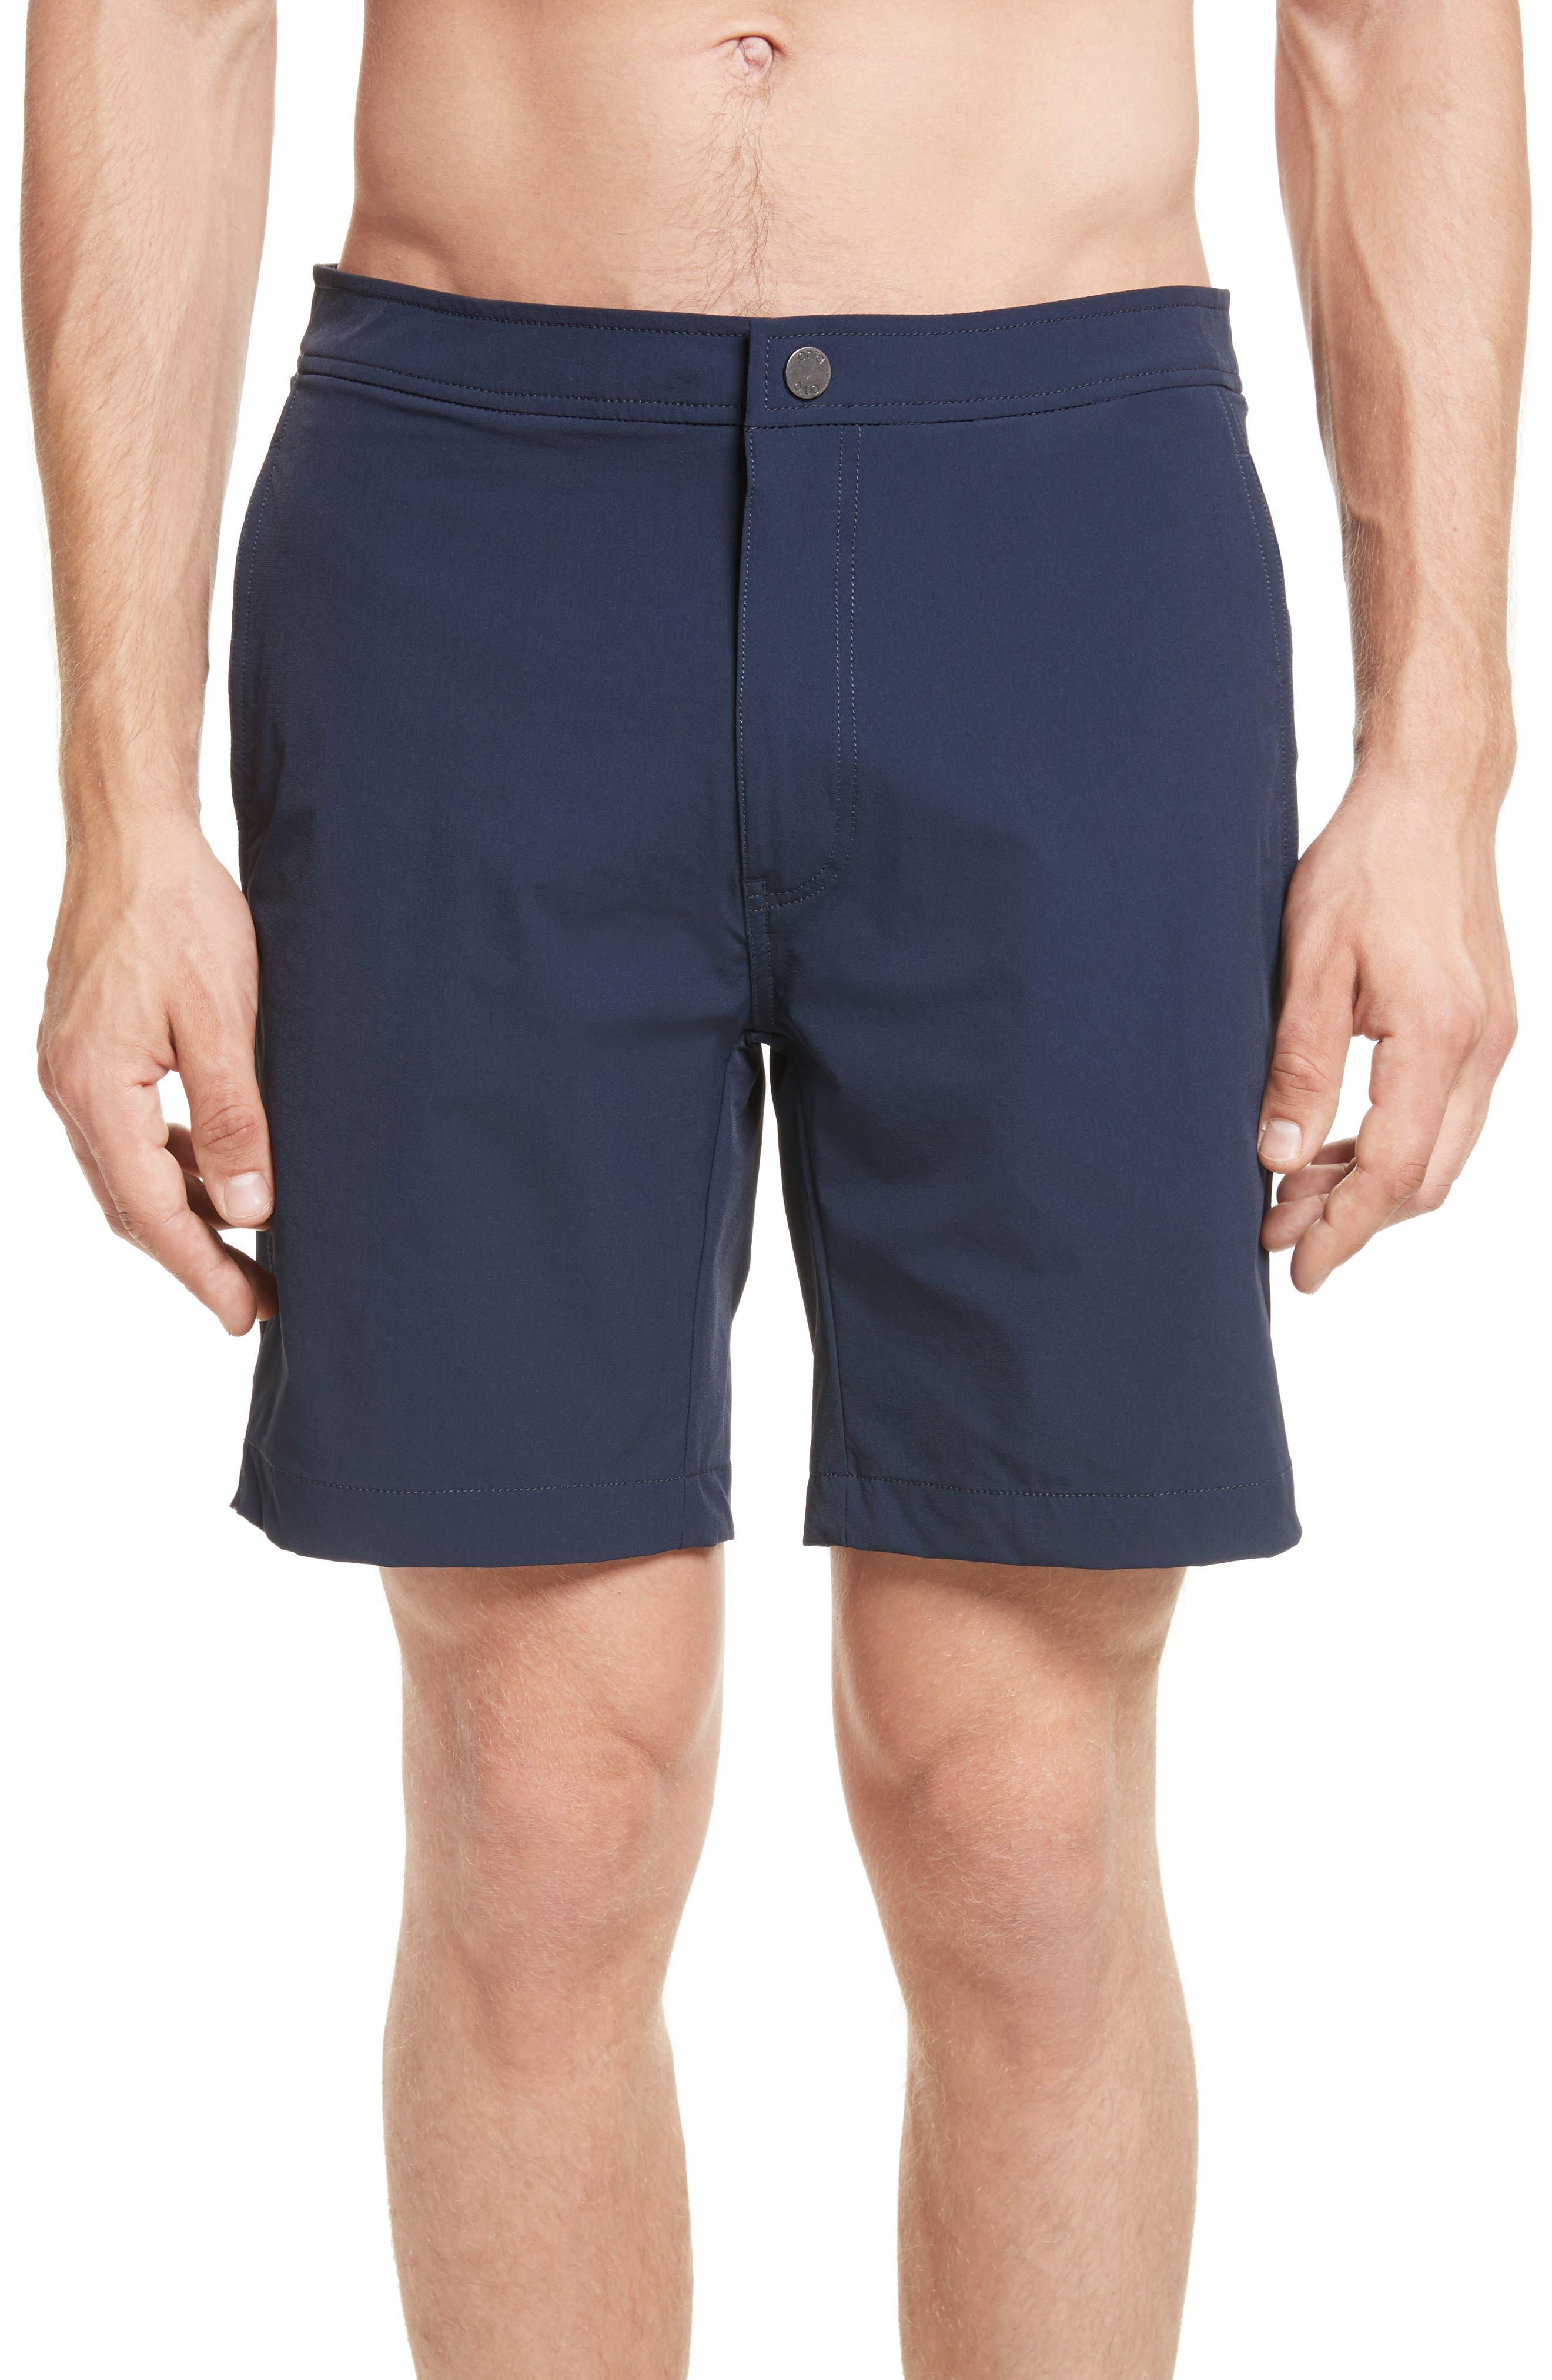 Calder Swim Trunks,                         Main,                         color, Deep Navy